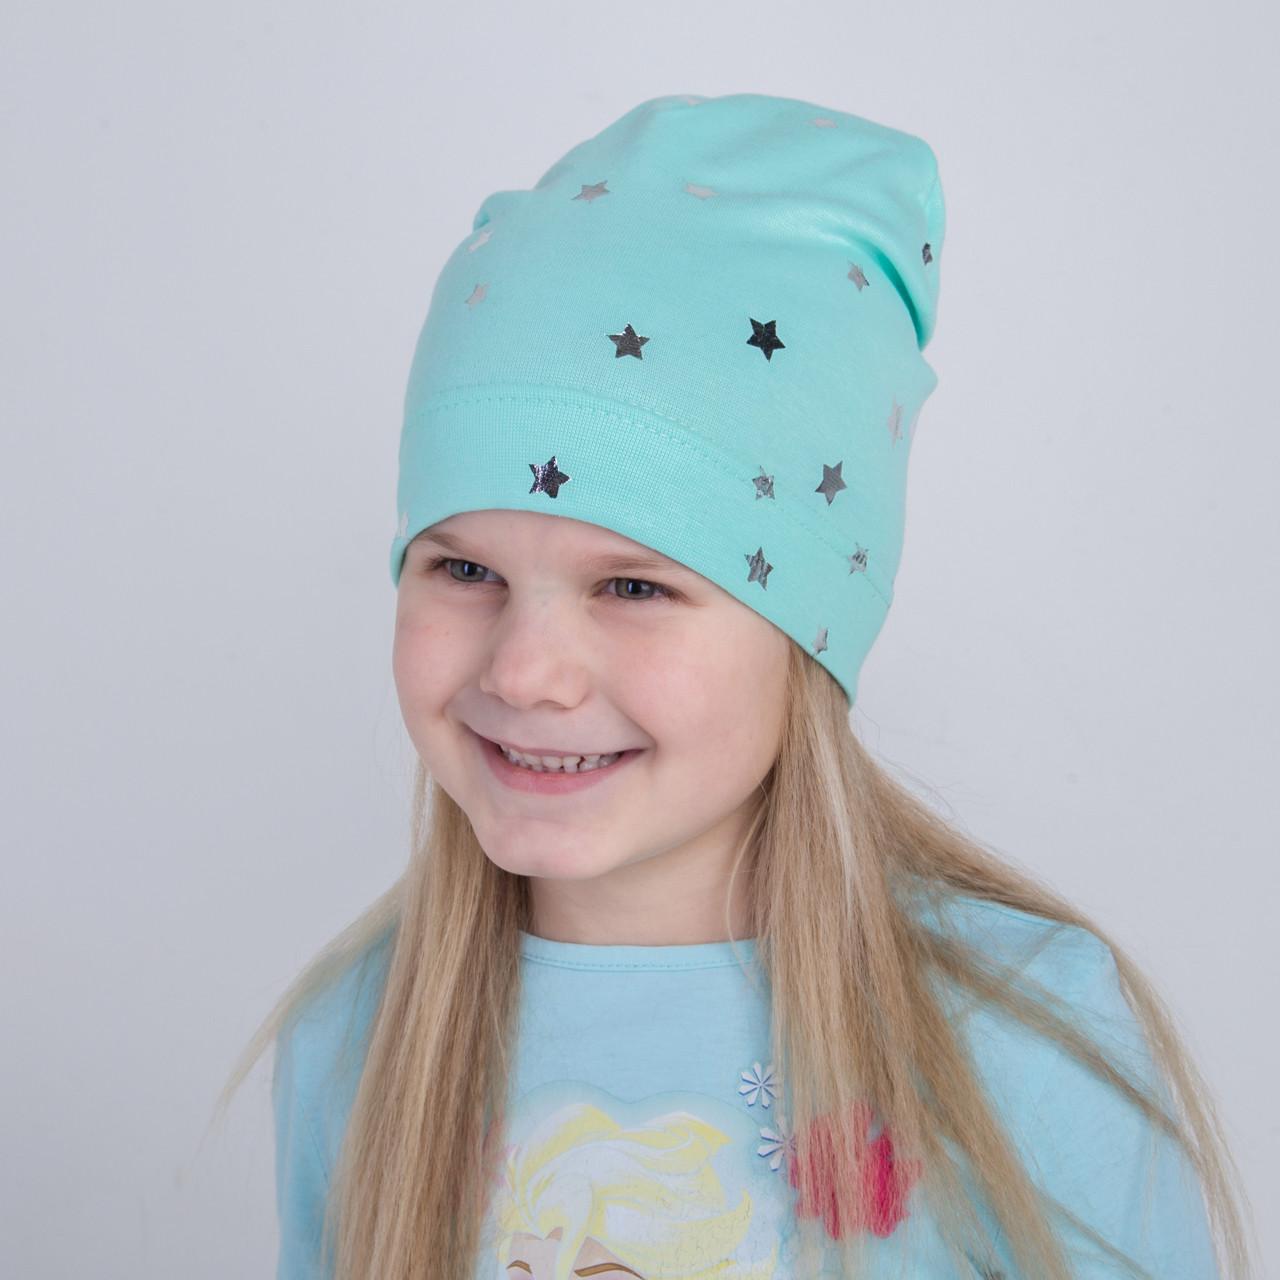 Шапка для девочек на весну оптом - Stars - Артикул 2215